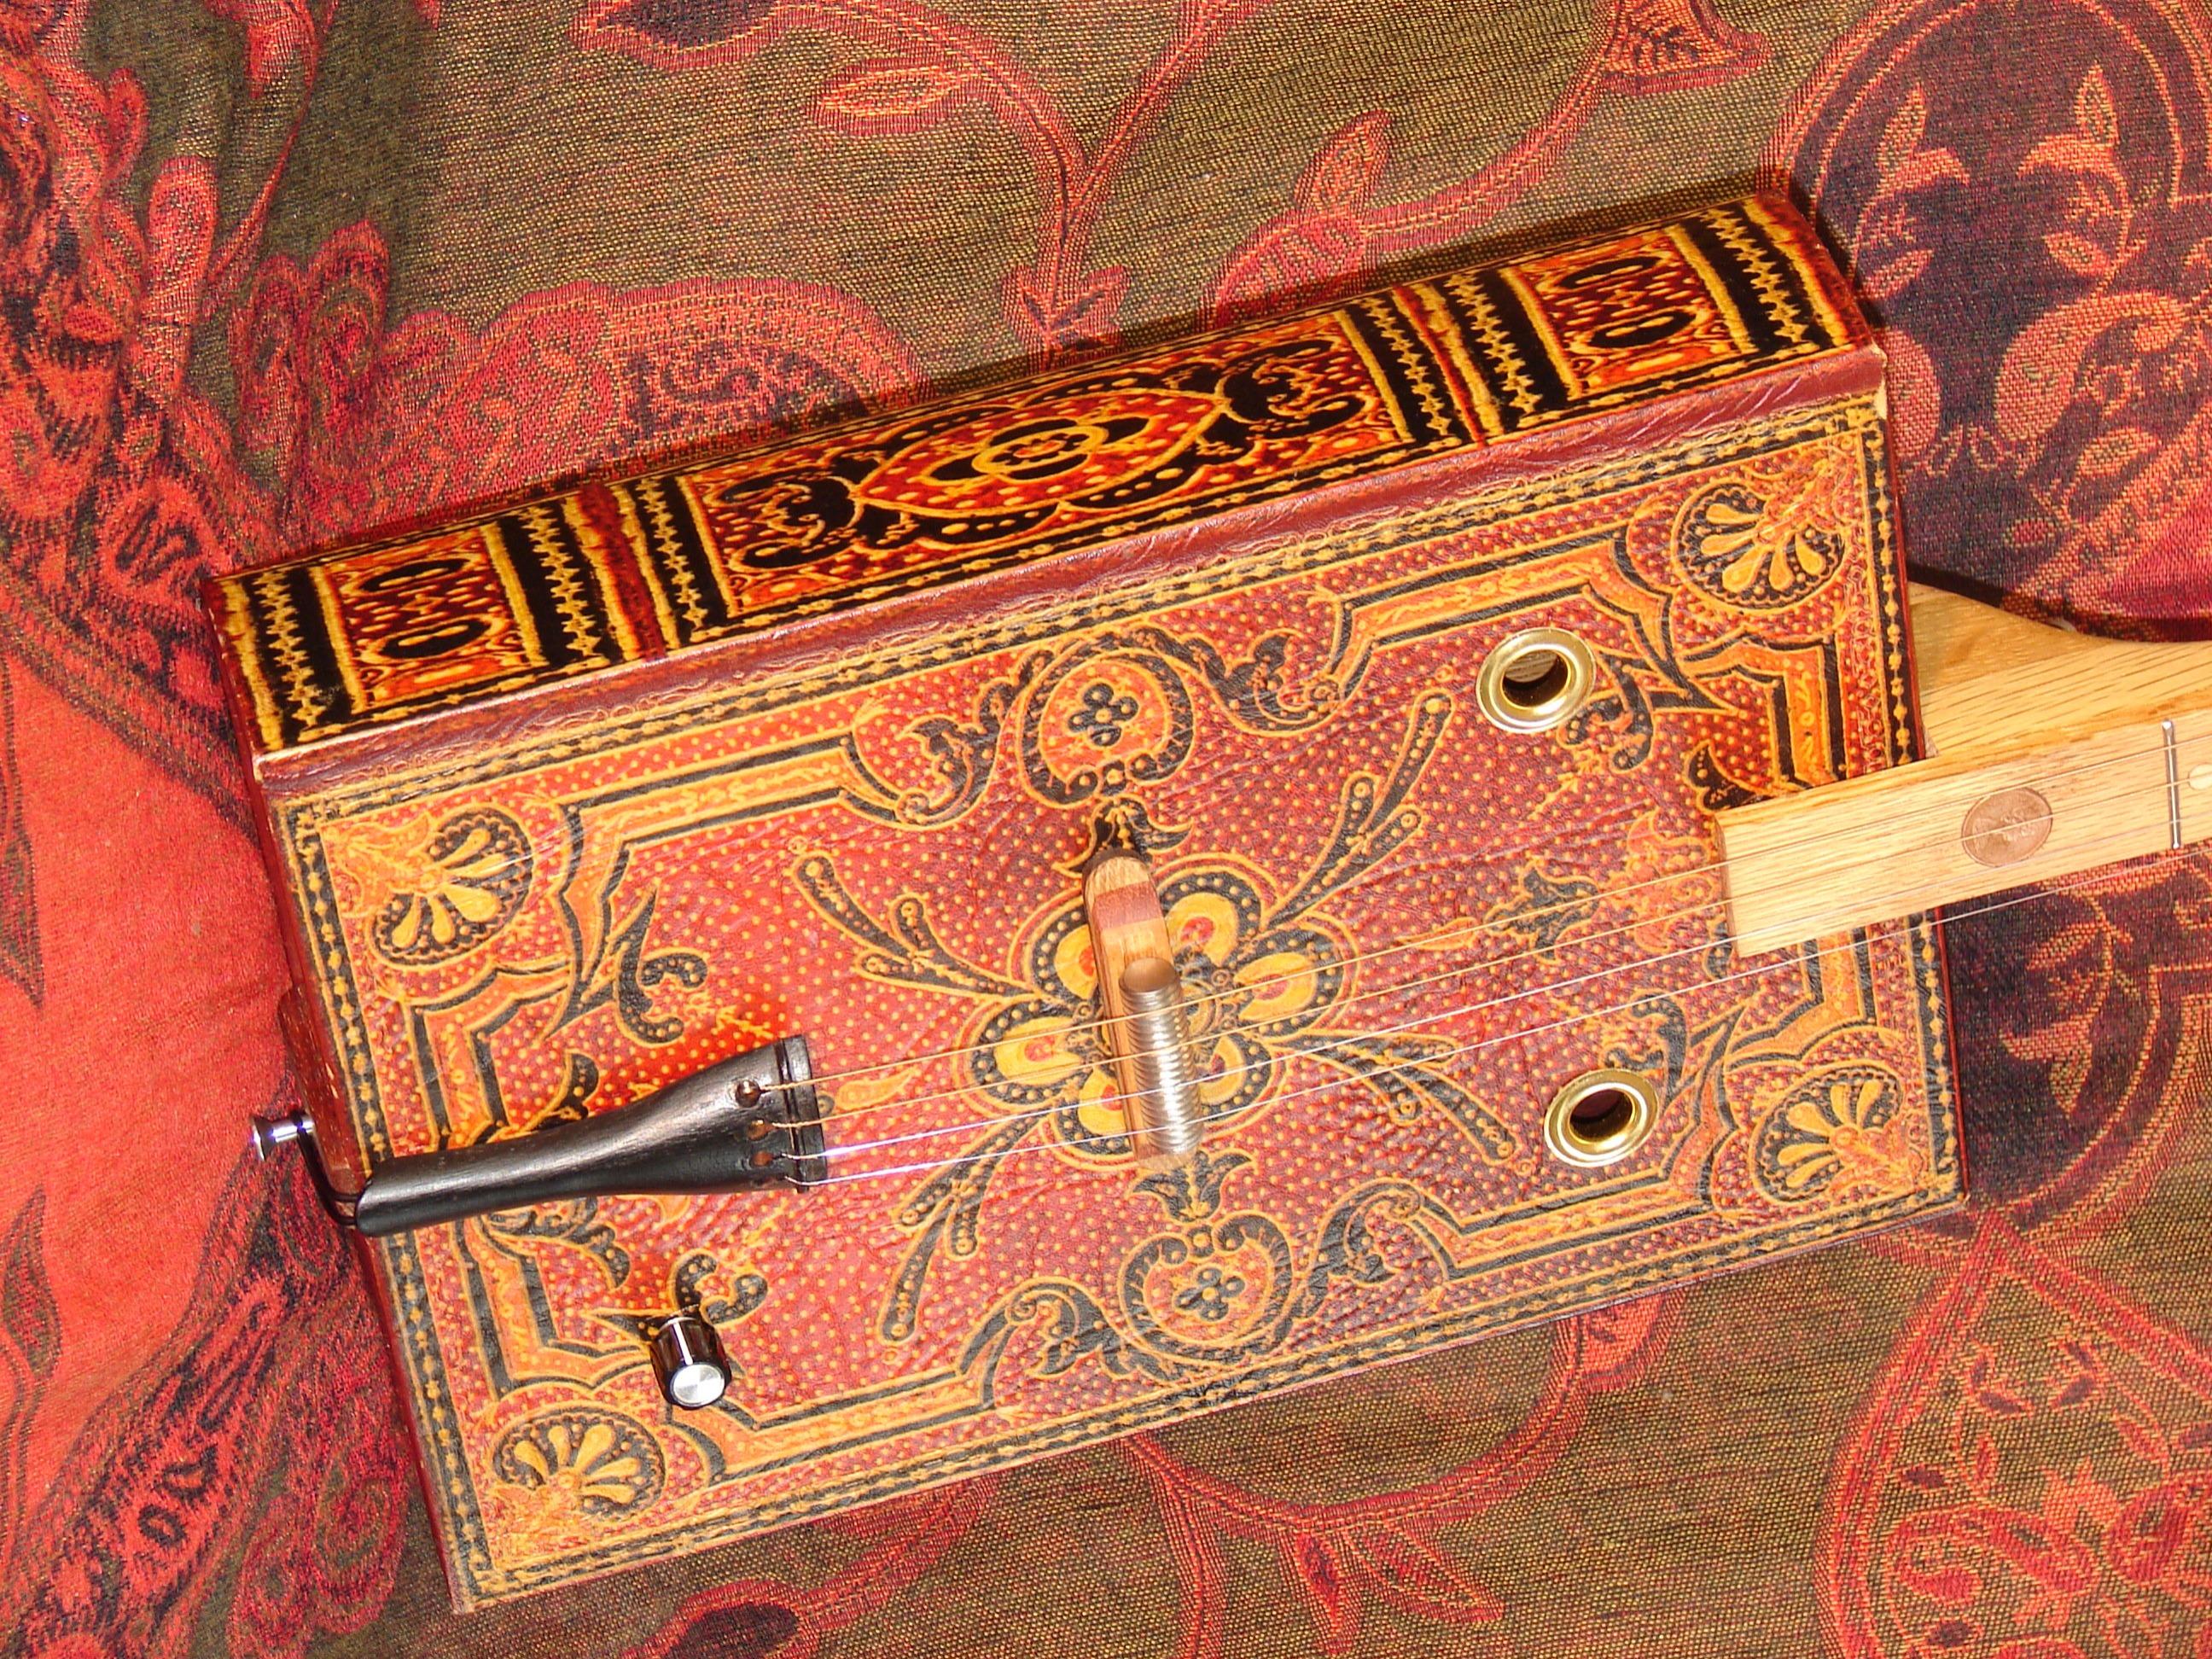 Violin tailpiece